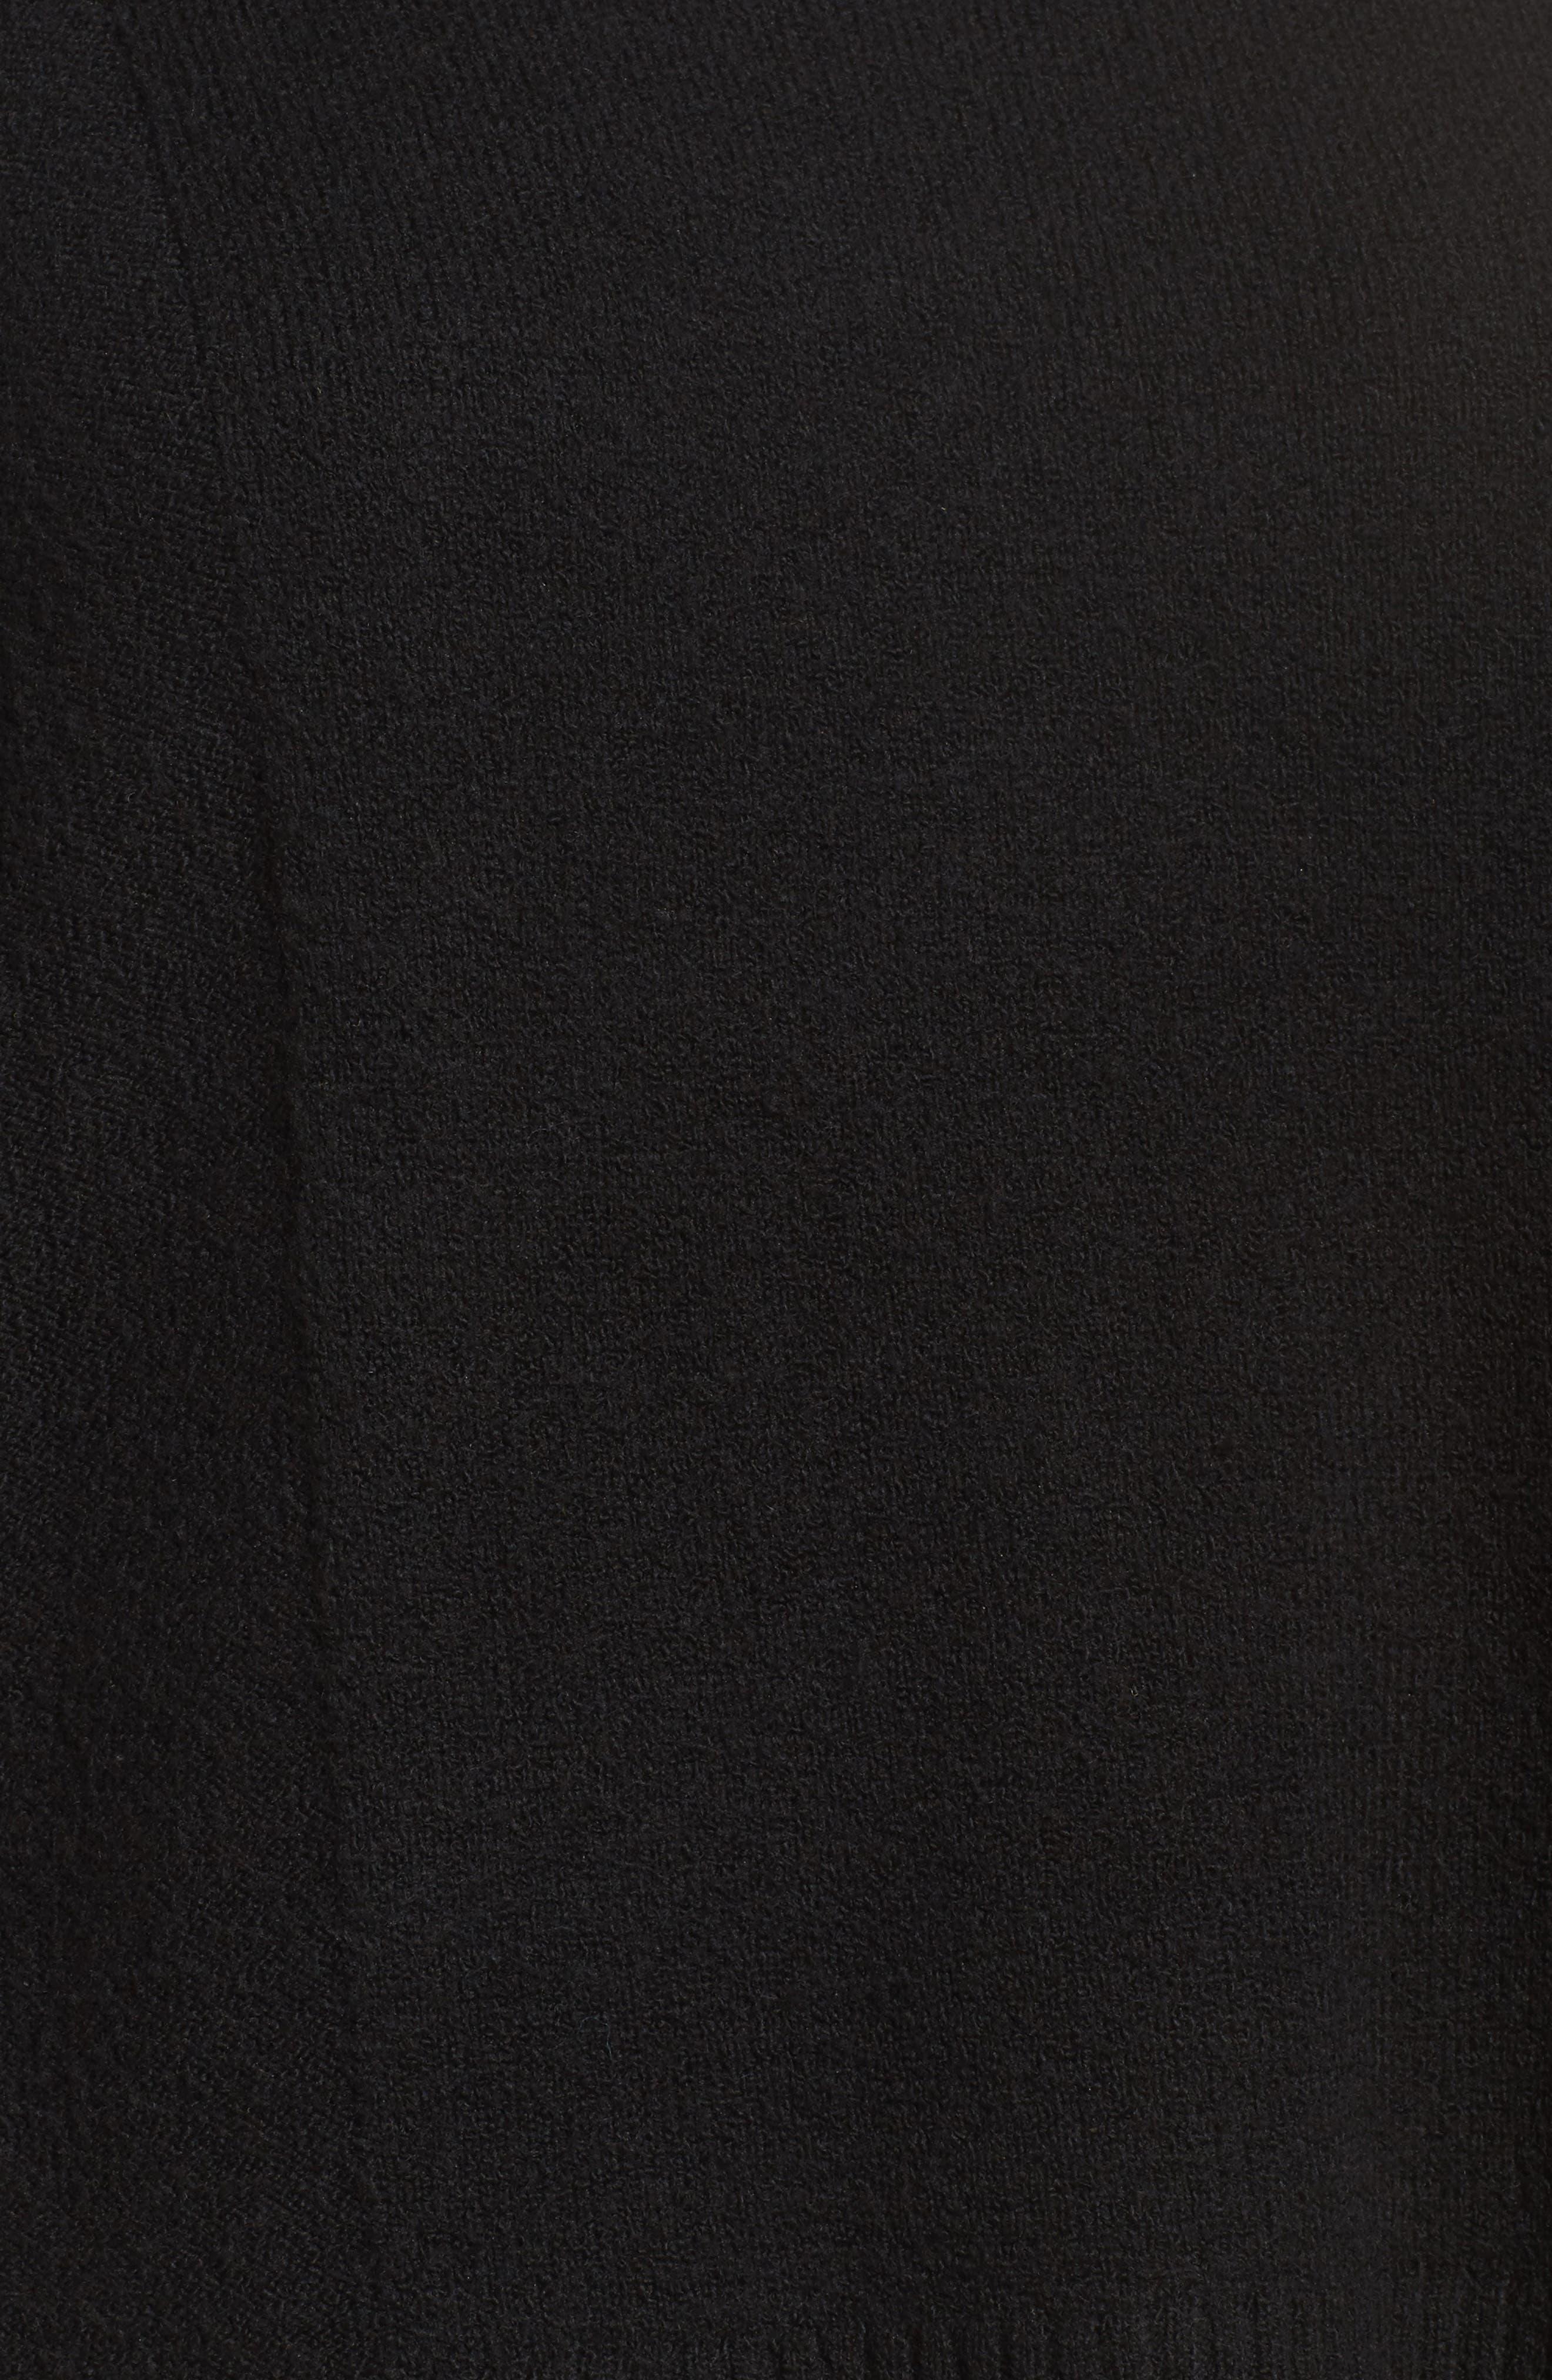 Fringe Poncho Sweater,                             Alternate thumbnail 5, color,                             001